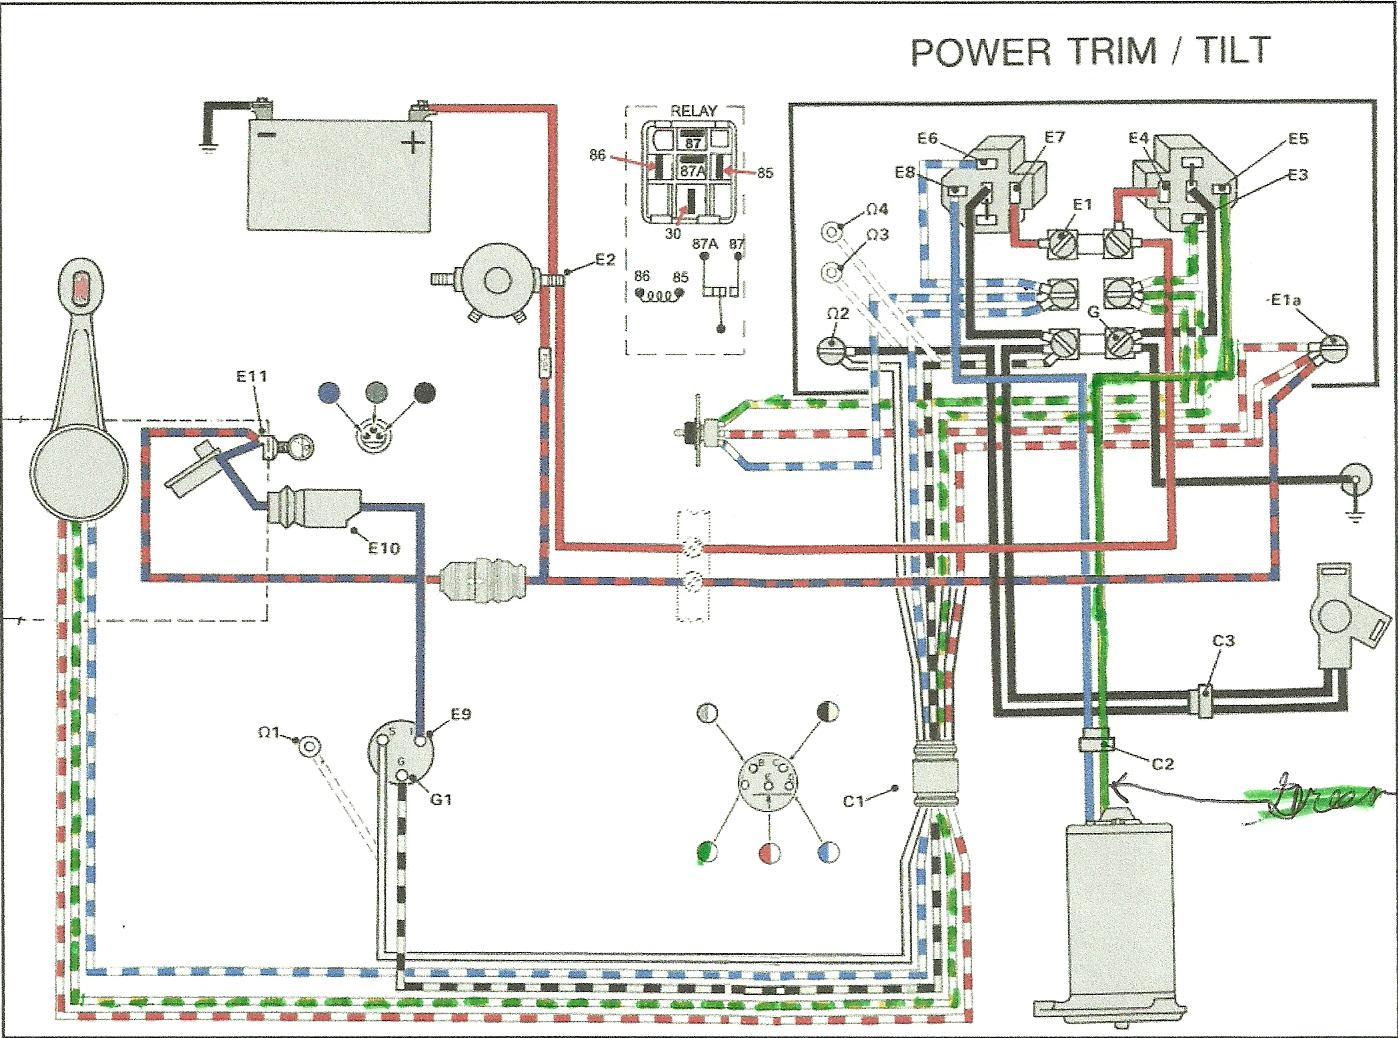 omc solenoid wiring diagram omc wiring diagram free